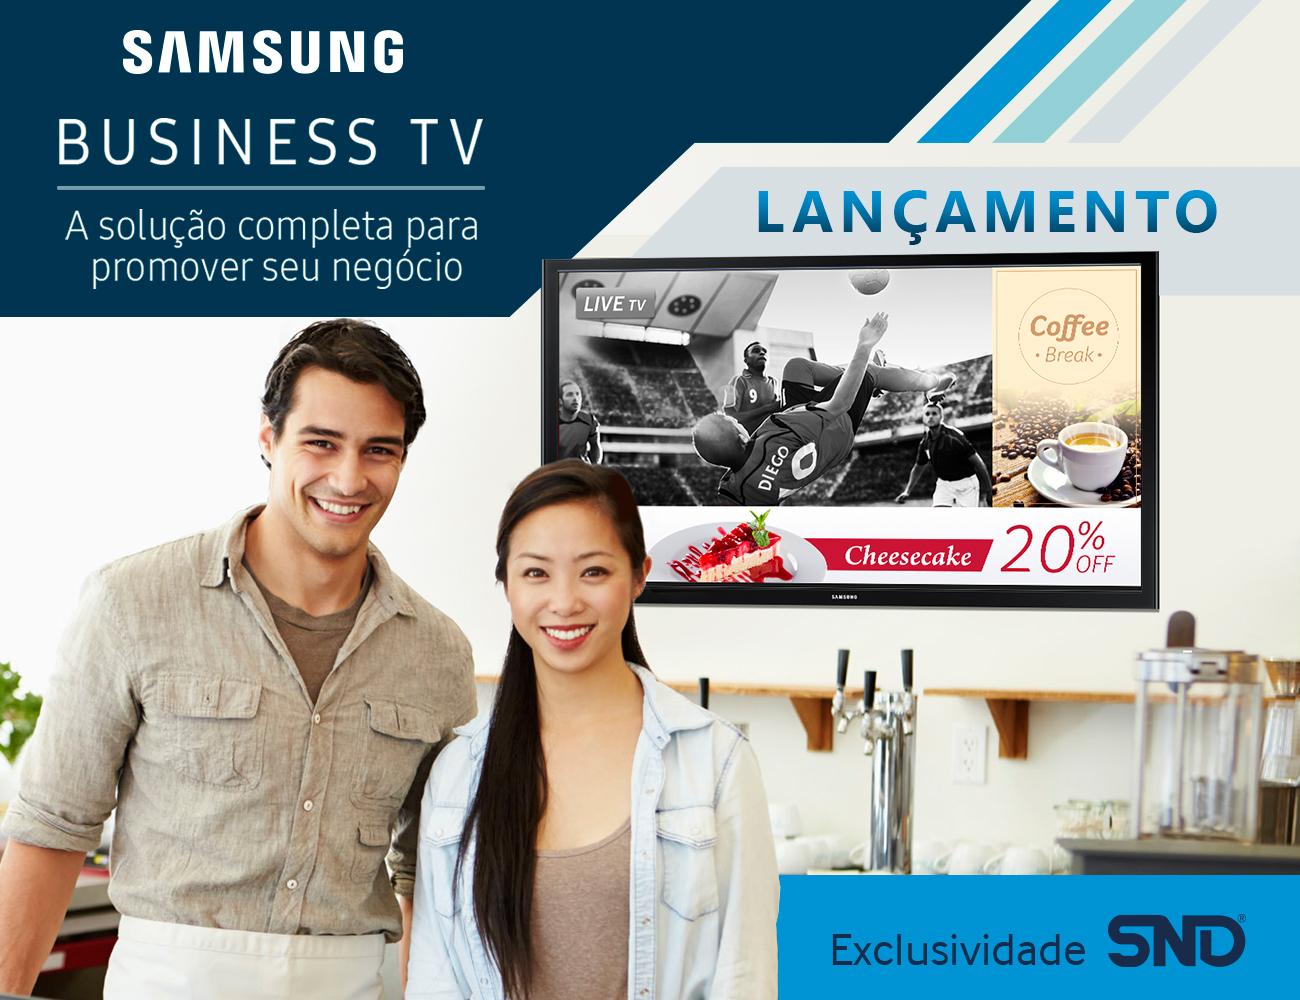 Business TV Samsung